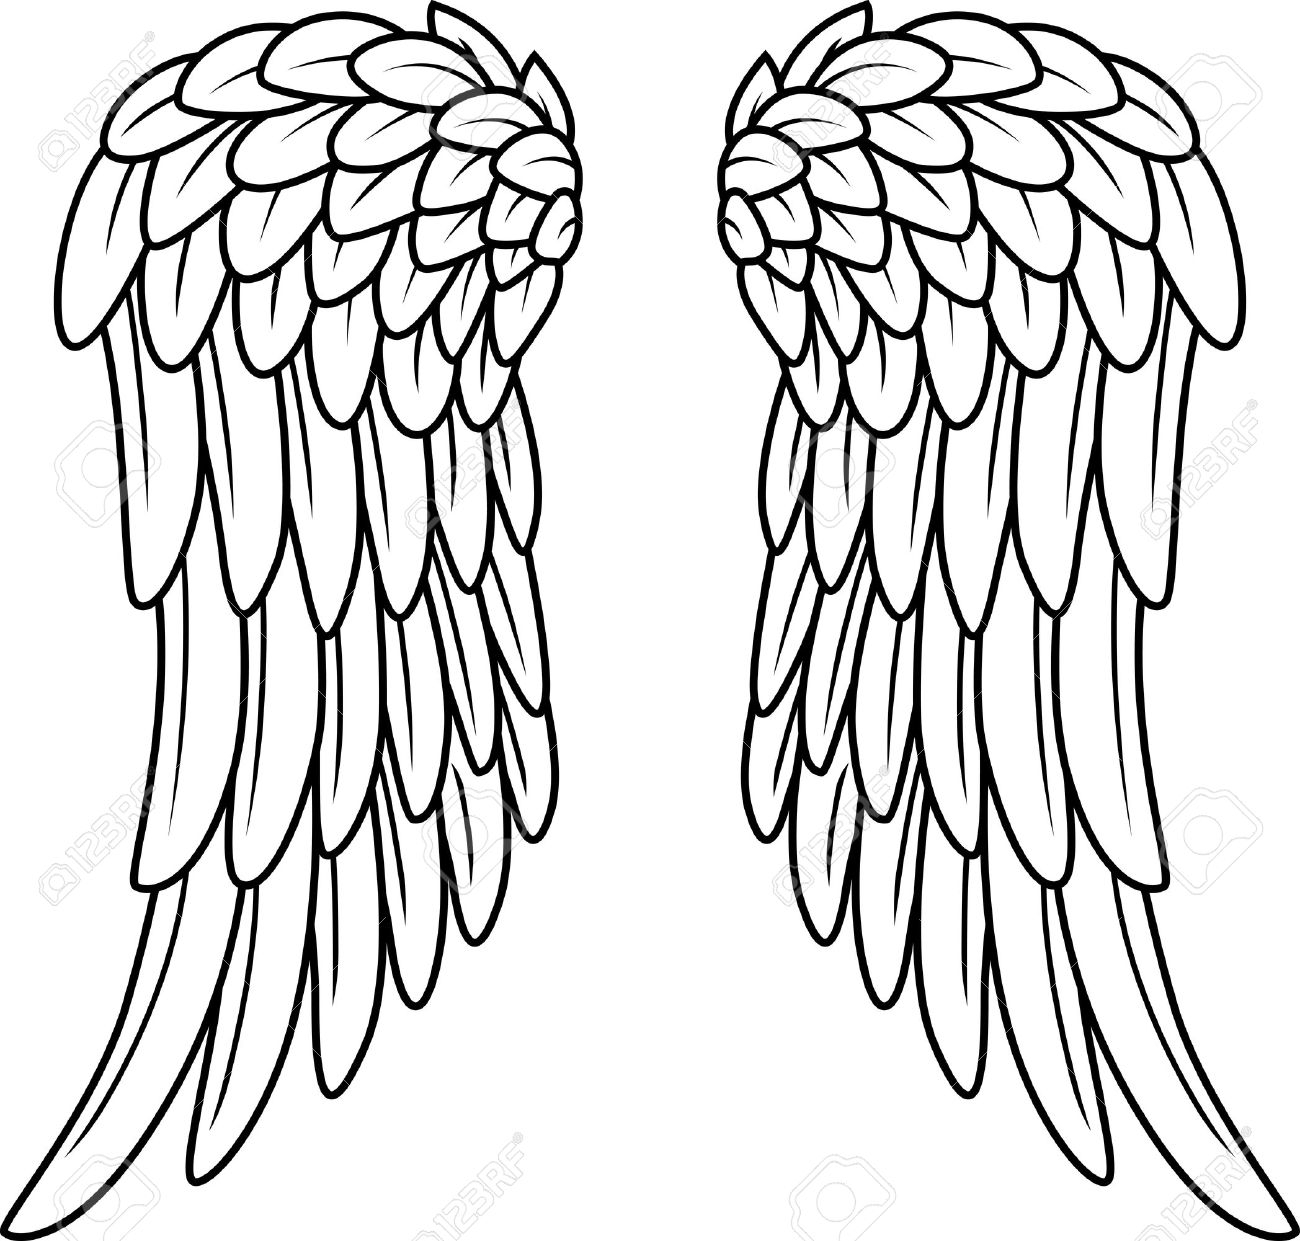 1300x1241 Angel Wing Cartoon Drawings